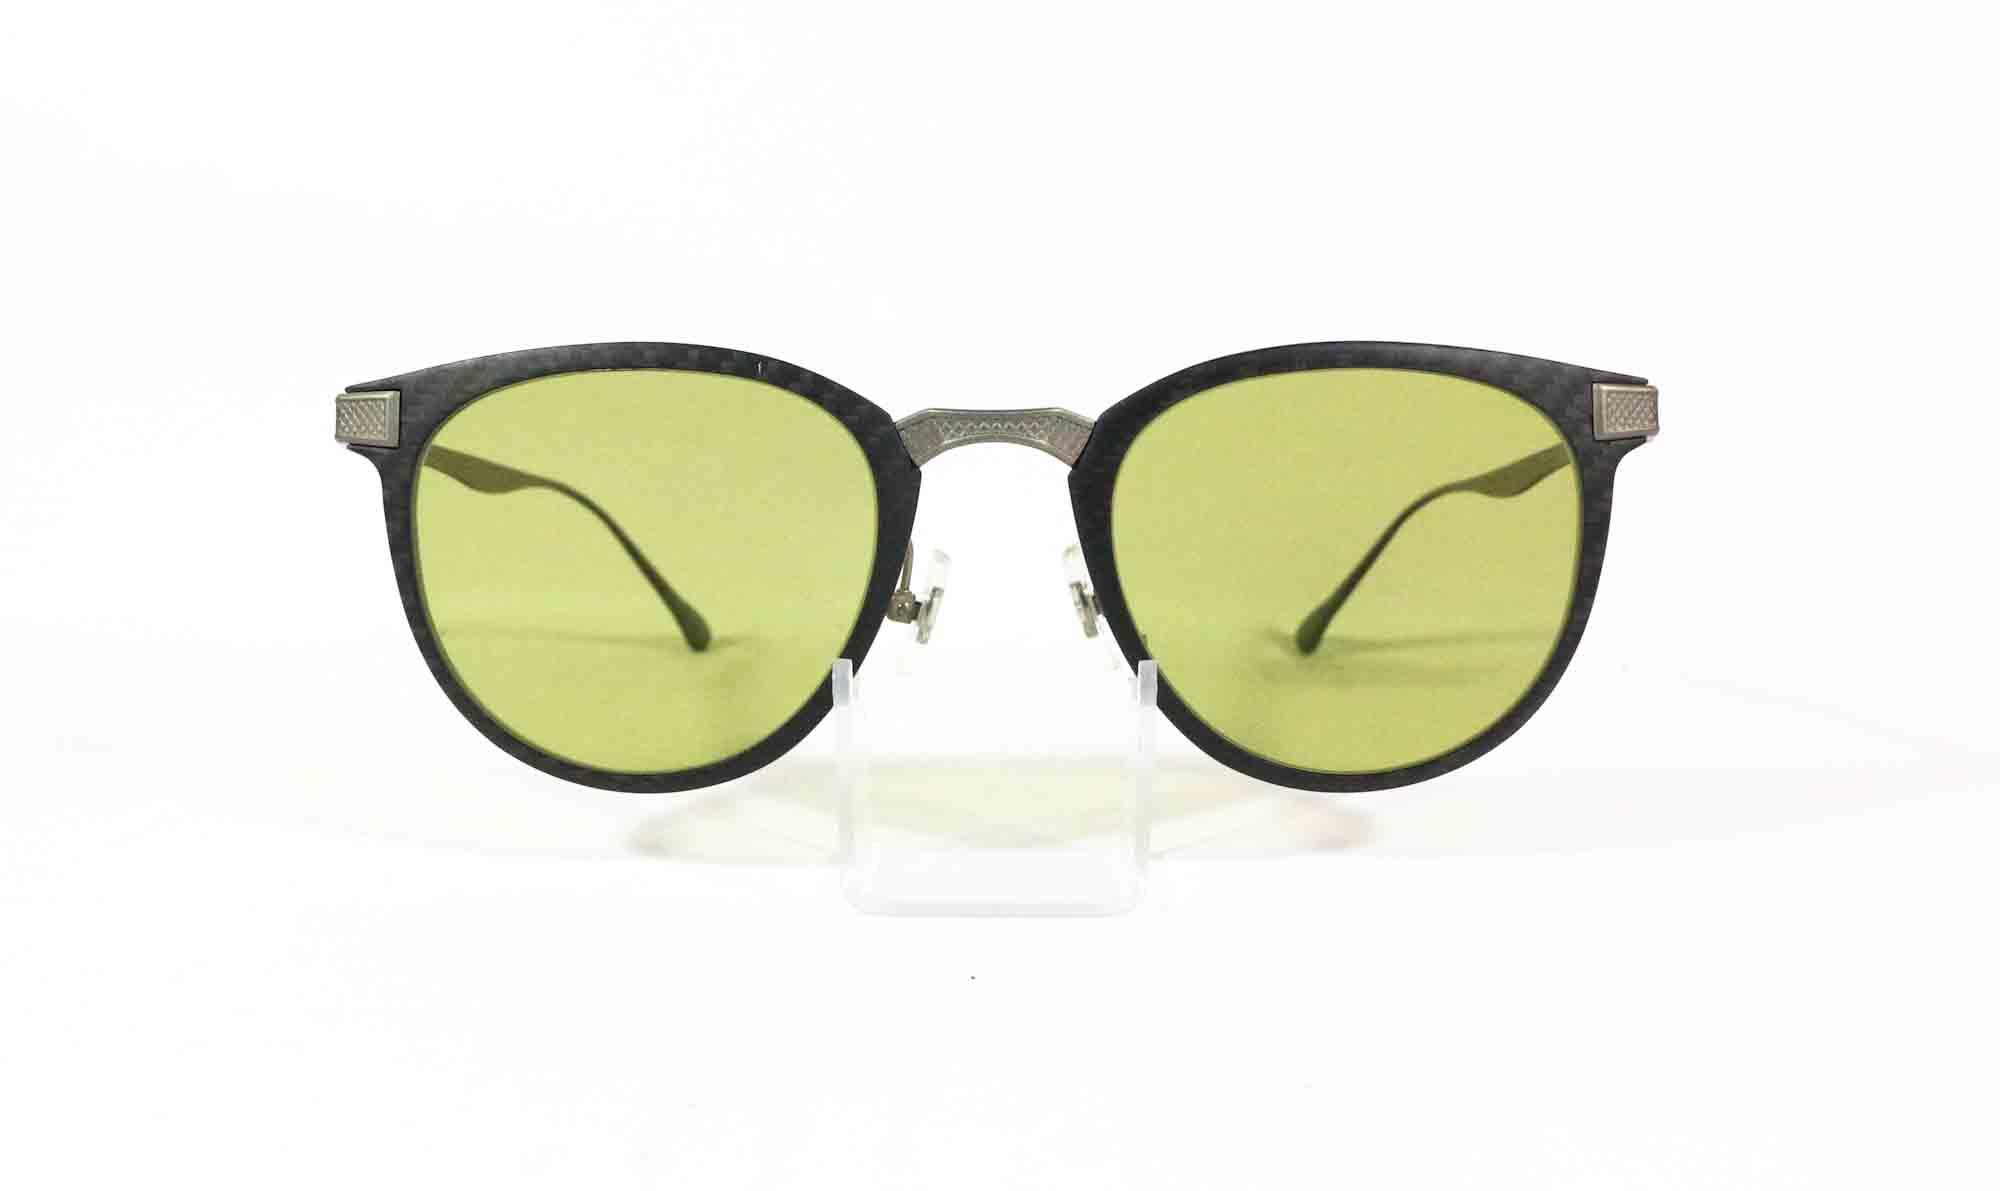 Zeal Polarised Fishing Sunglasses Jaz F-1881 Ease Green / Silver Blk (8300)